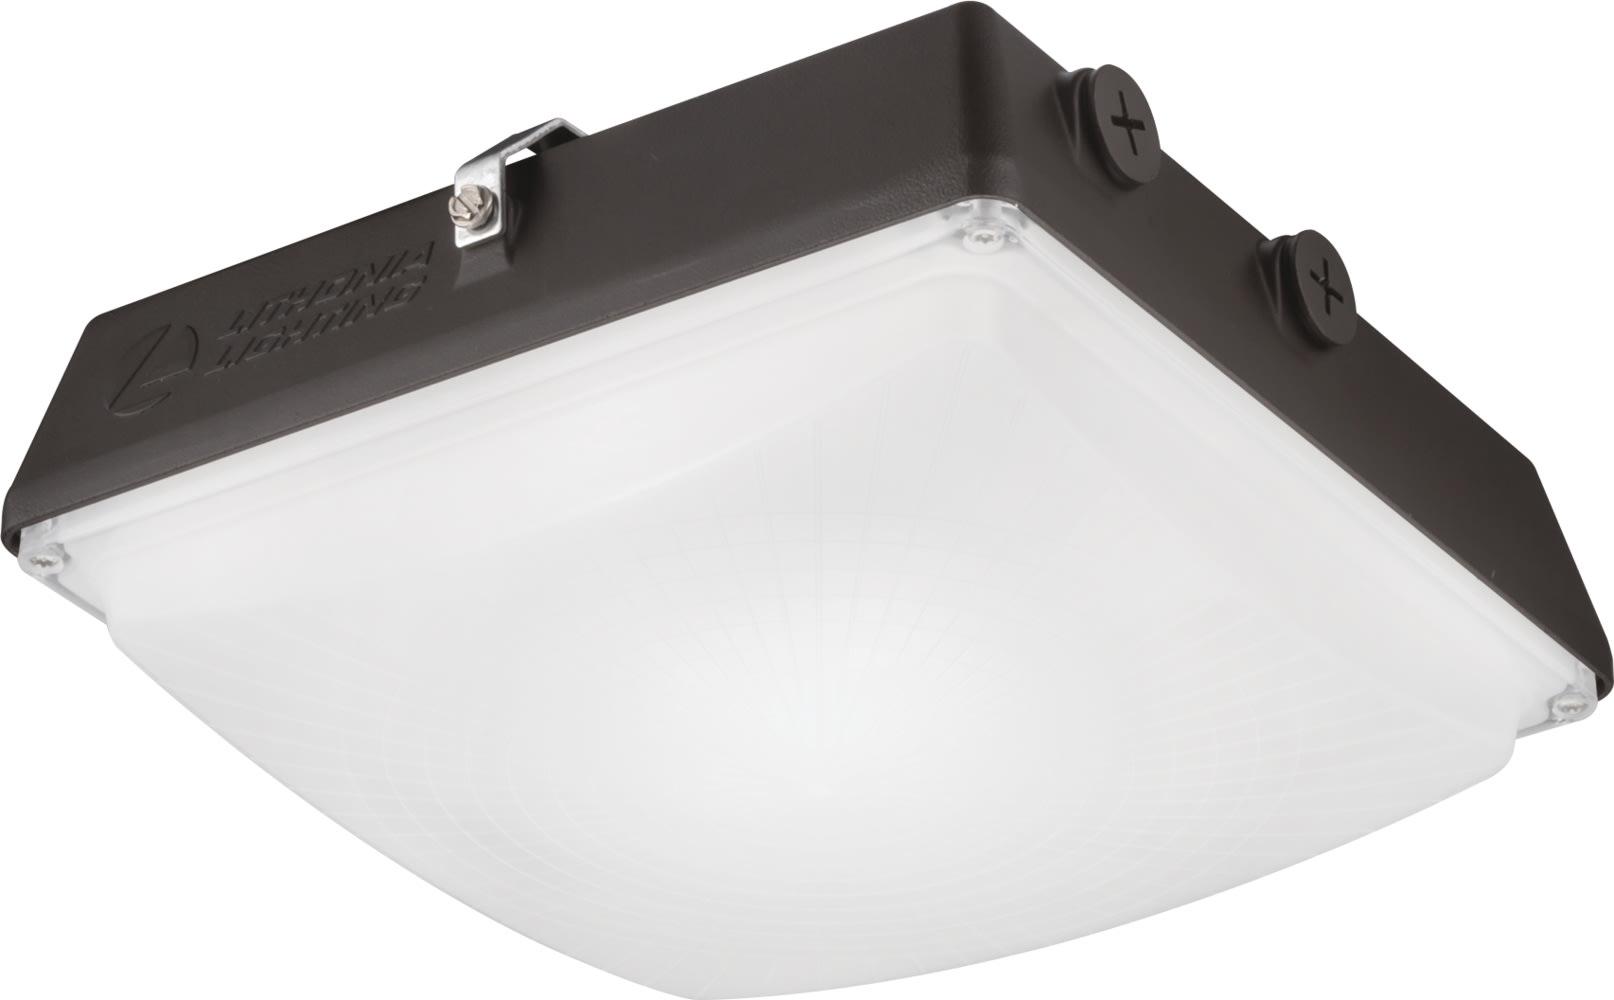 Lithonia Lighting CNY LED P4 MVOLT M2